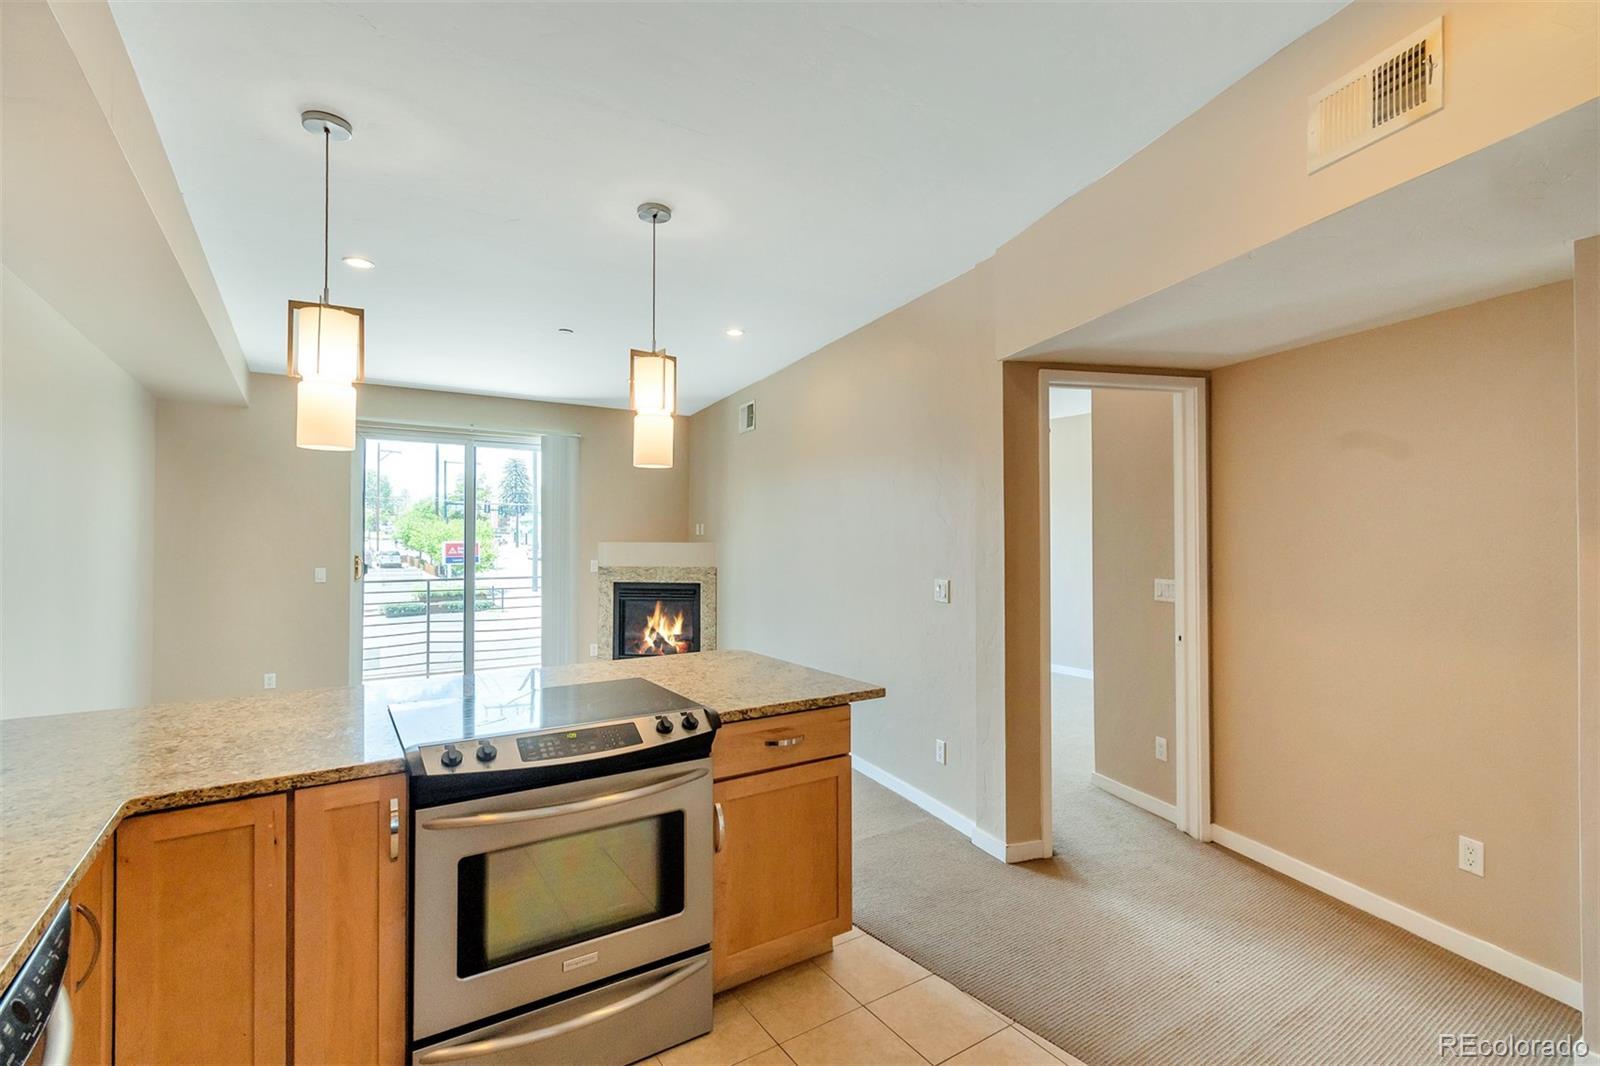 2900 W 44th Avenue #204 Property Photo - Denver, CO real estate listing